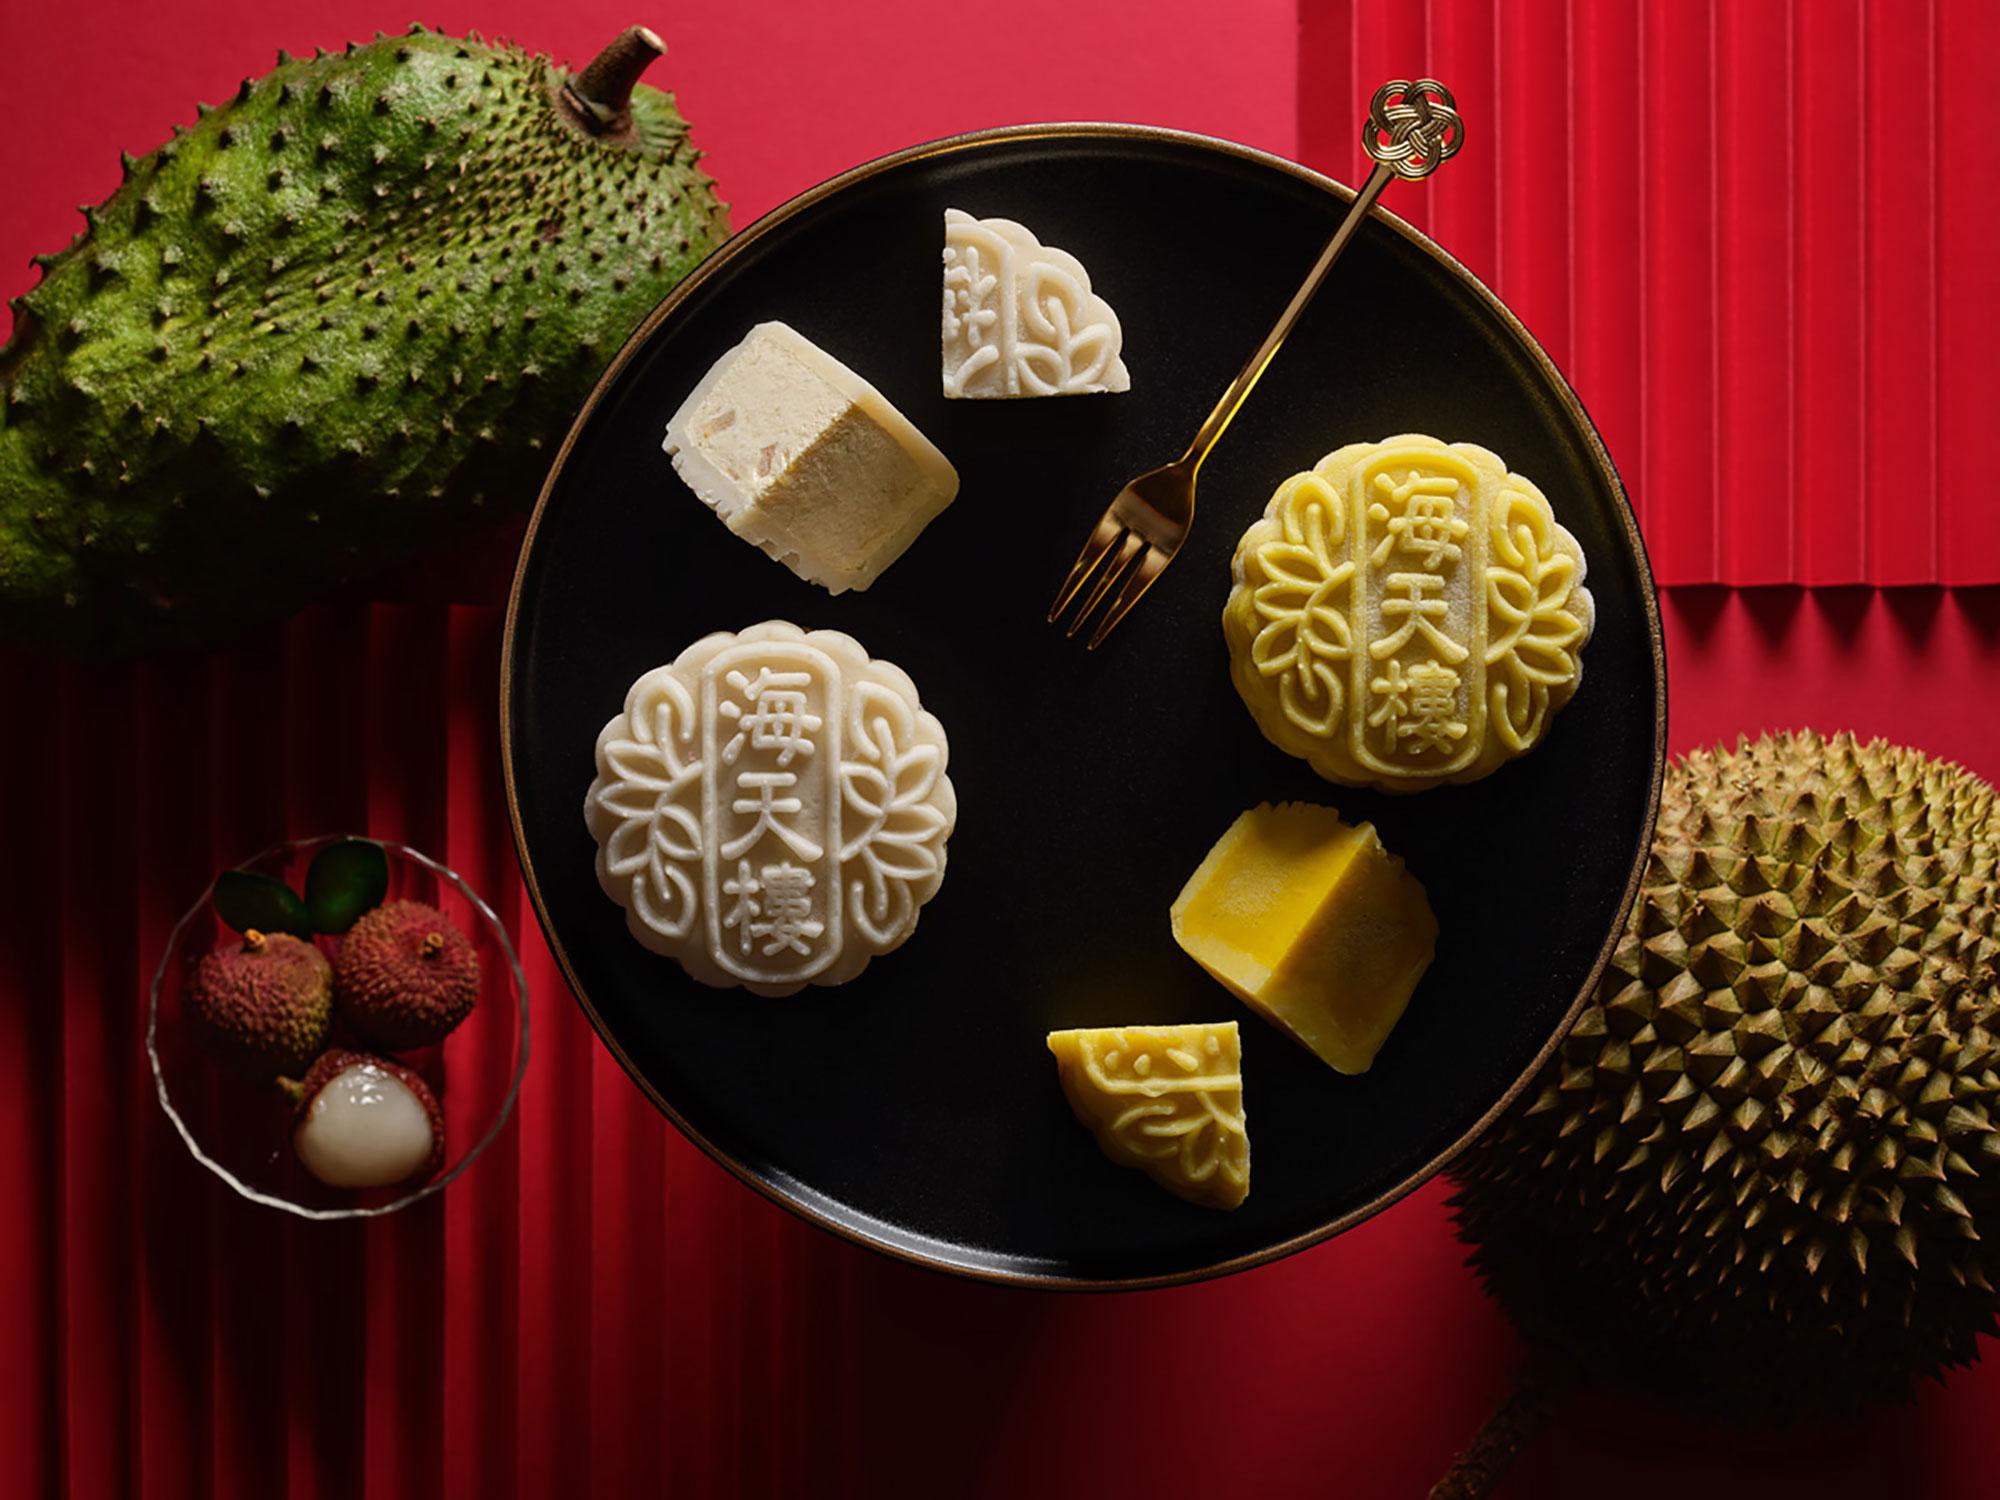 Soursop-Lychee-Snowskin-and-Mao-Shan-Wang-Durian-Snowskin